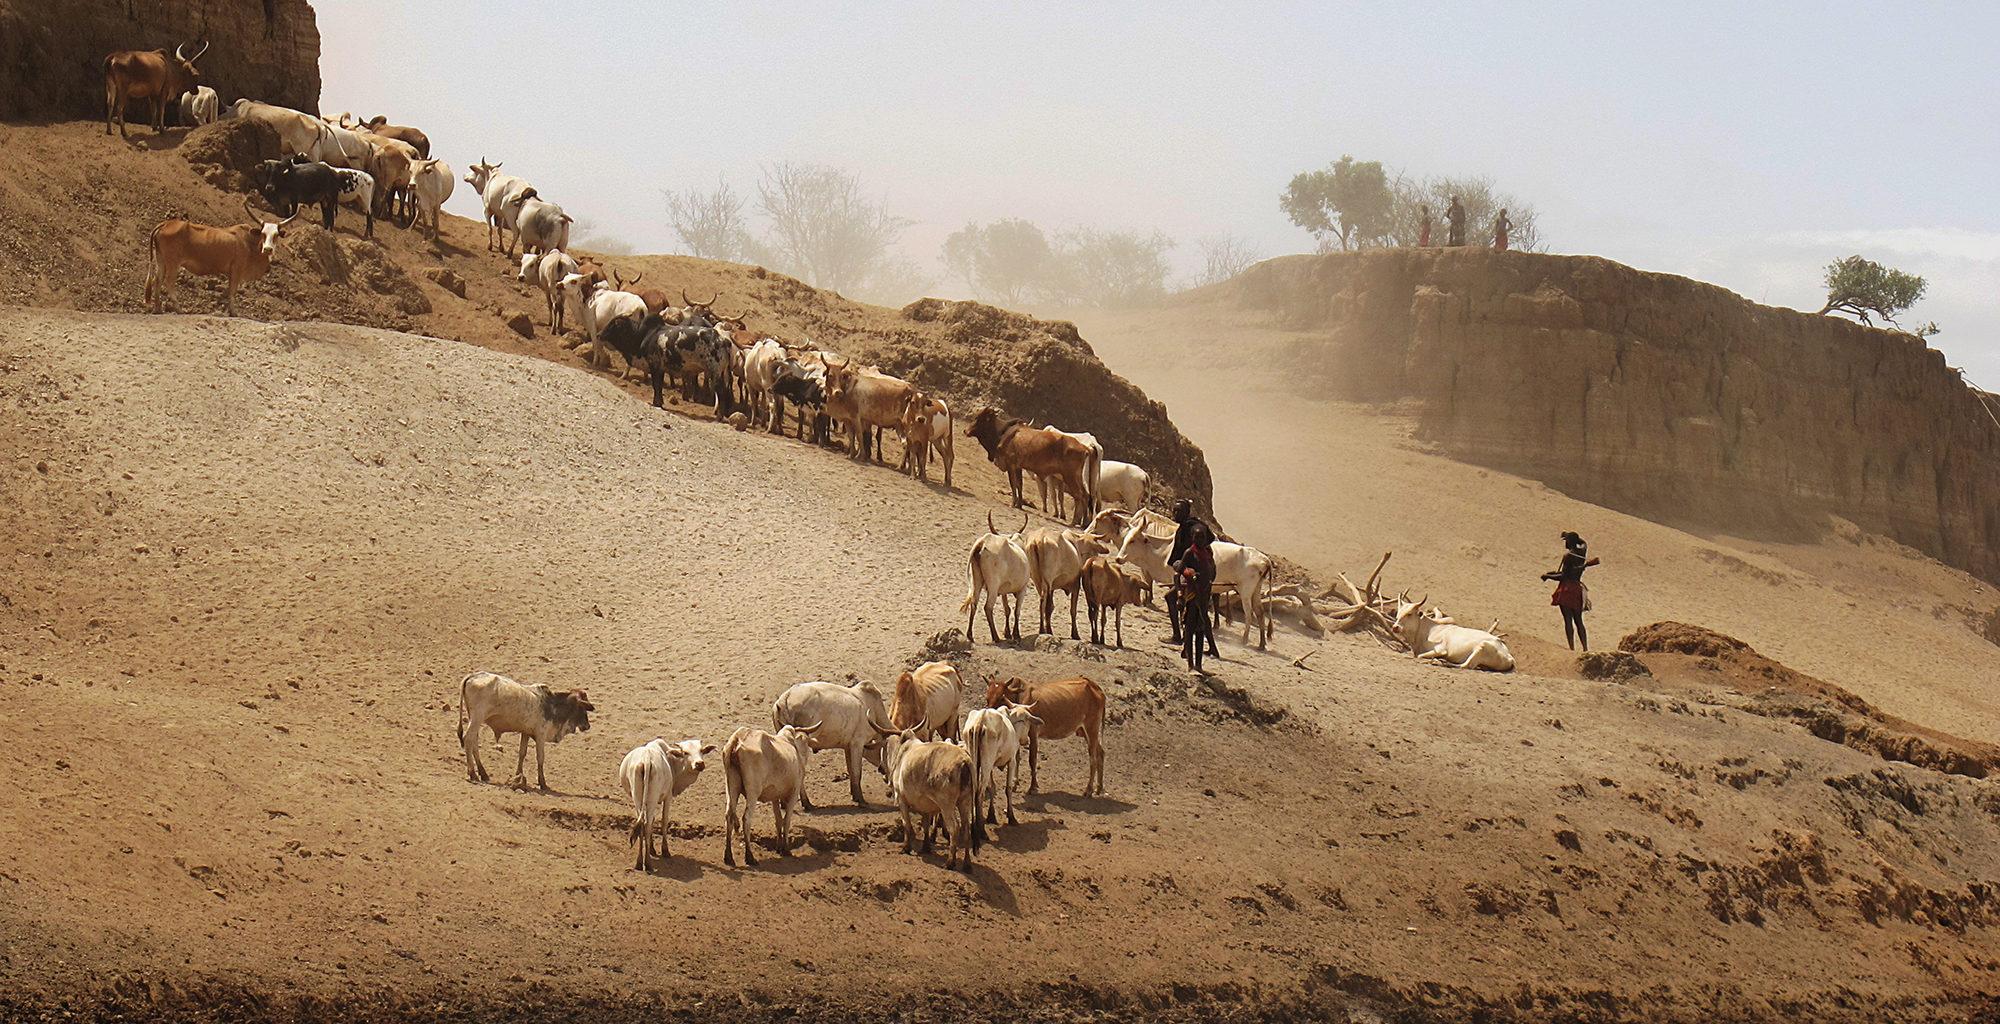 Ethiopia-Omo-Valley-Cattle